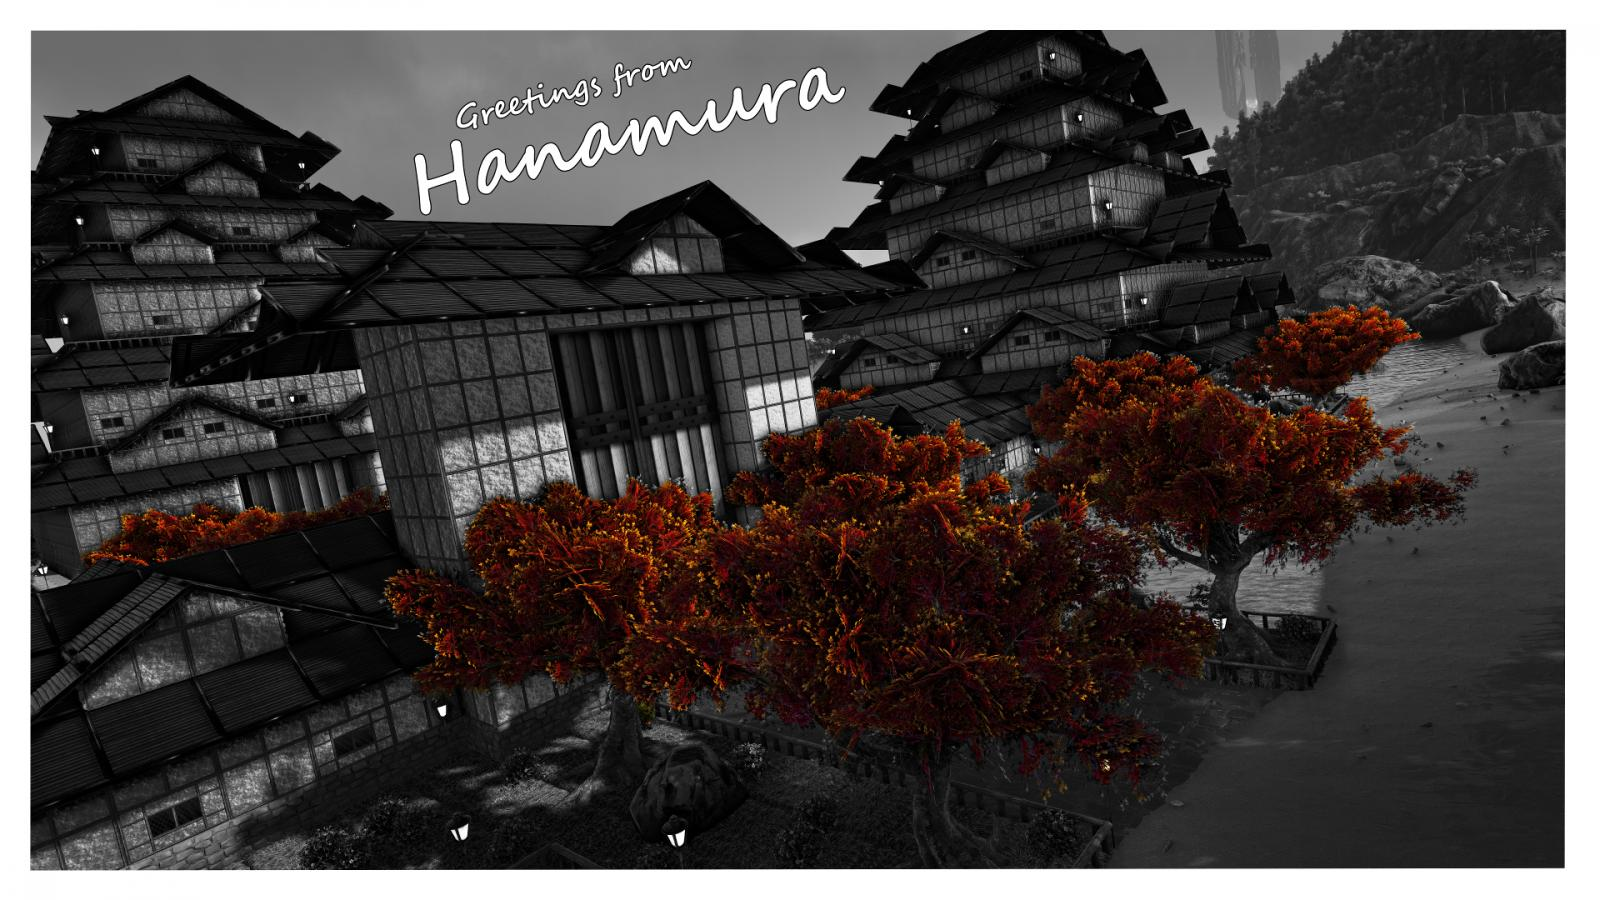 large.599782b56ec81_WolfAngelus-(Postcard)GreetingsfromHanamura-Freeform.jpg